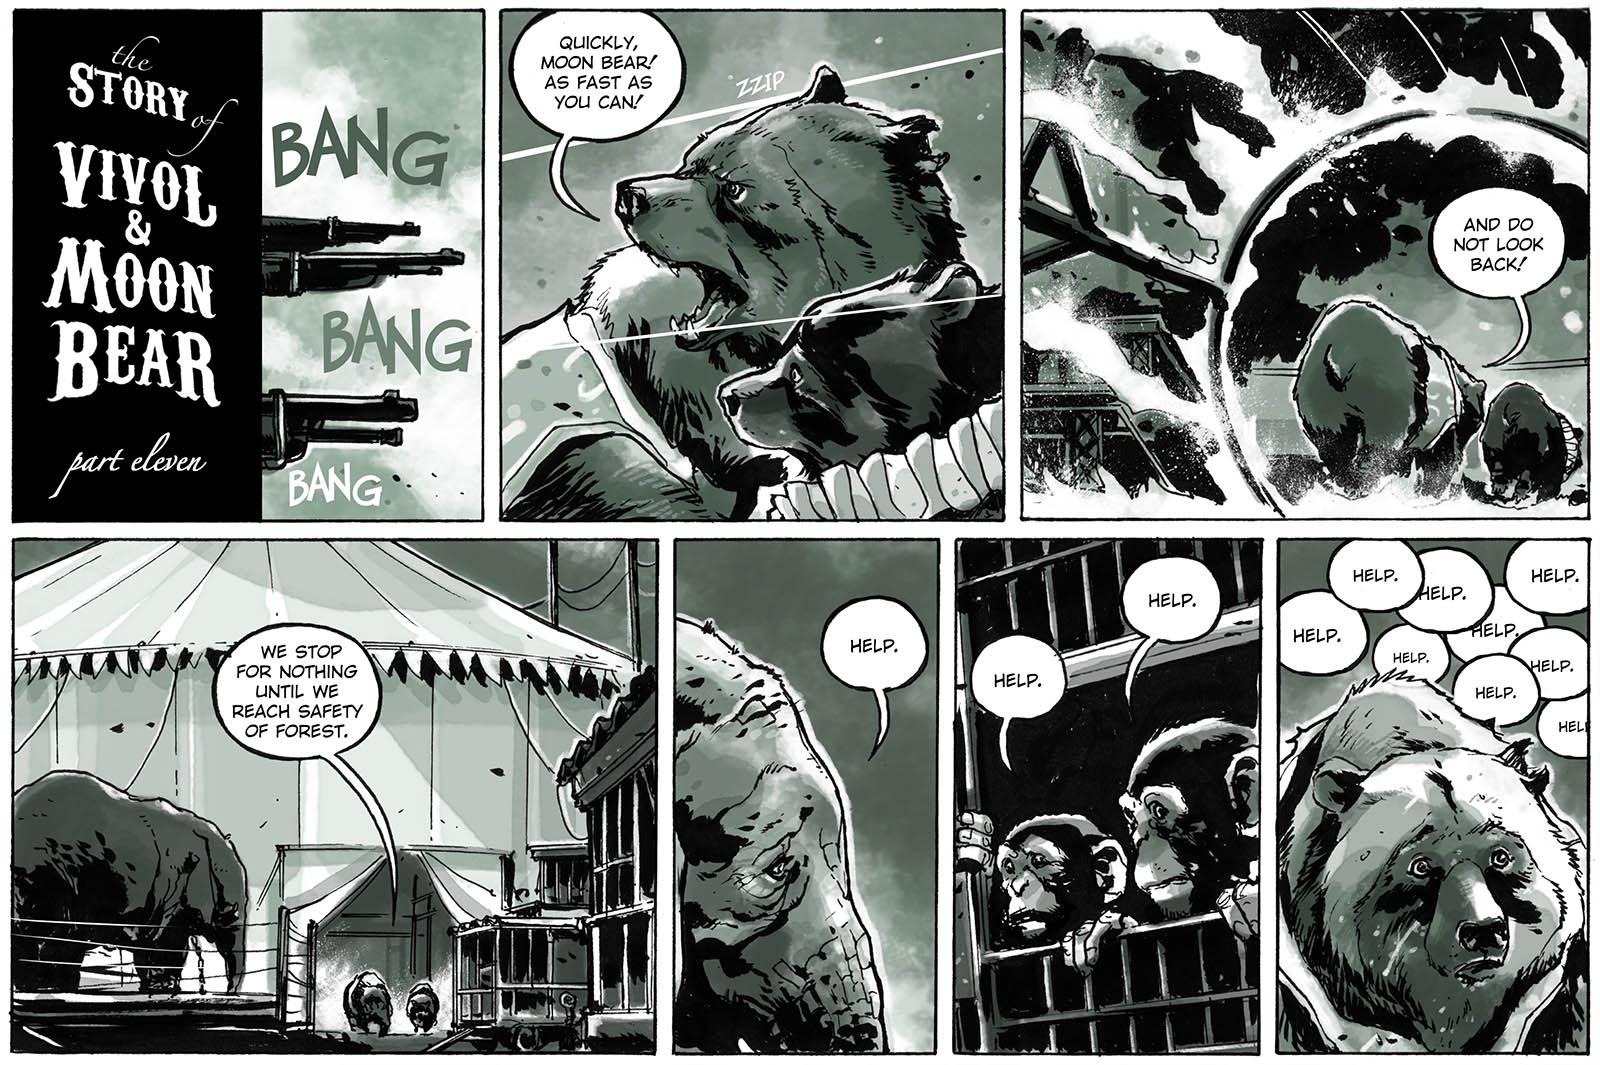 The Story of Vivol & Moon Bear – part eleven